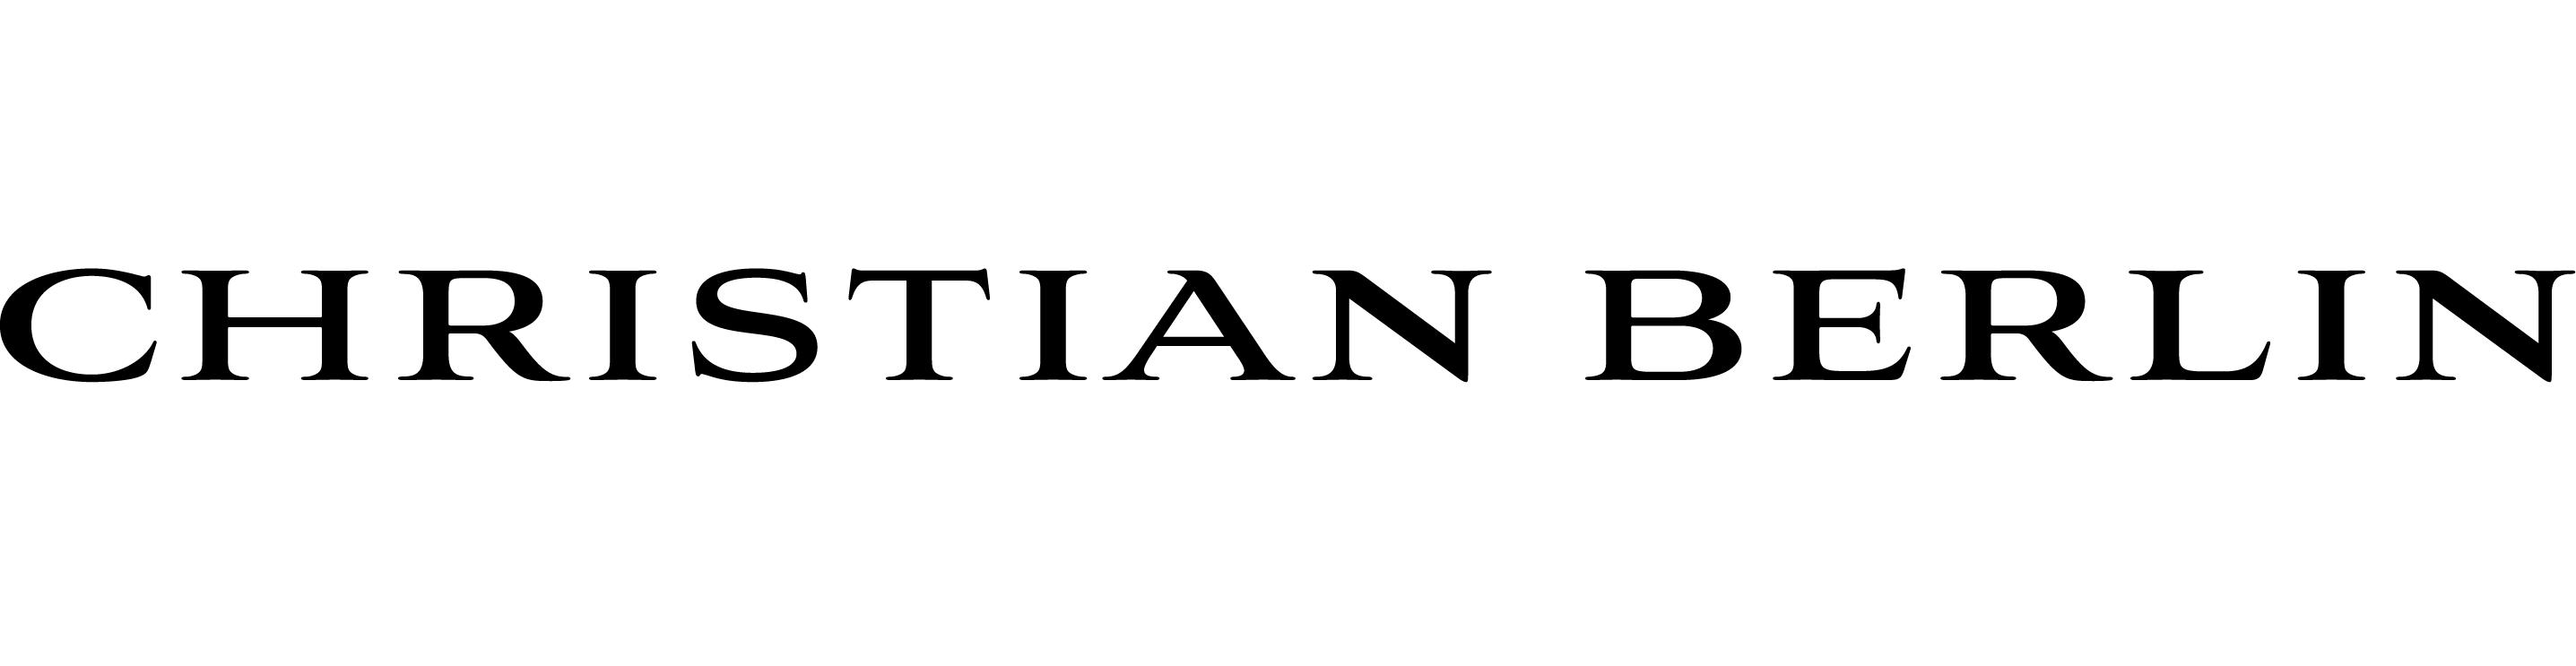 christian-berlin-logo